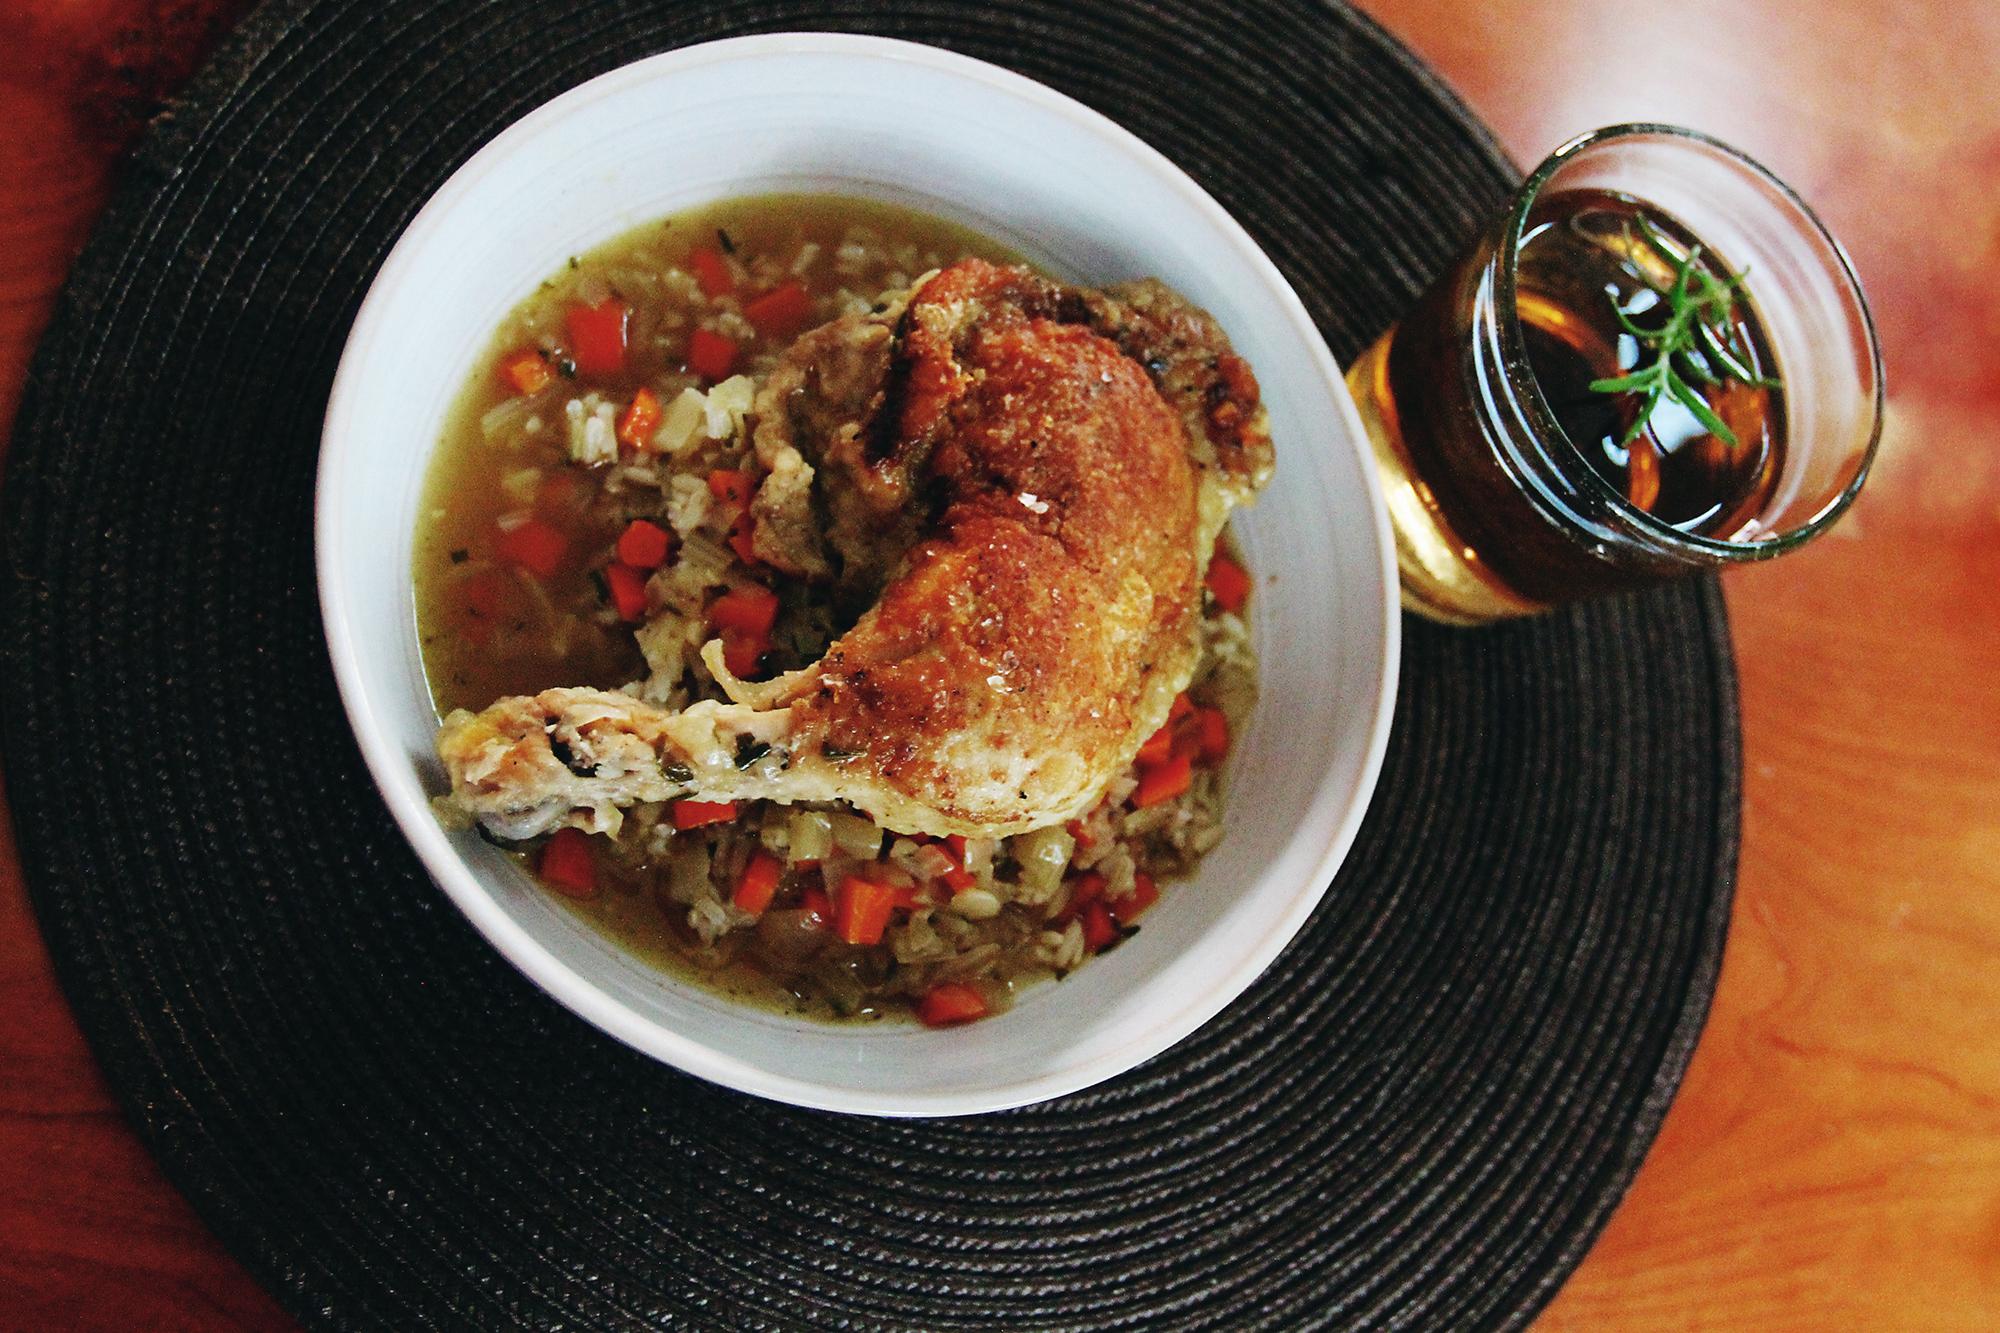 jo-torrijos-states-of-reverie-braised-chicken-thighs-and-legs-recipe-1.jpg